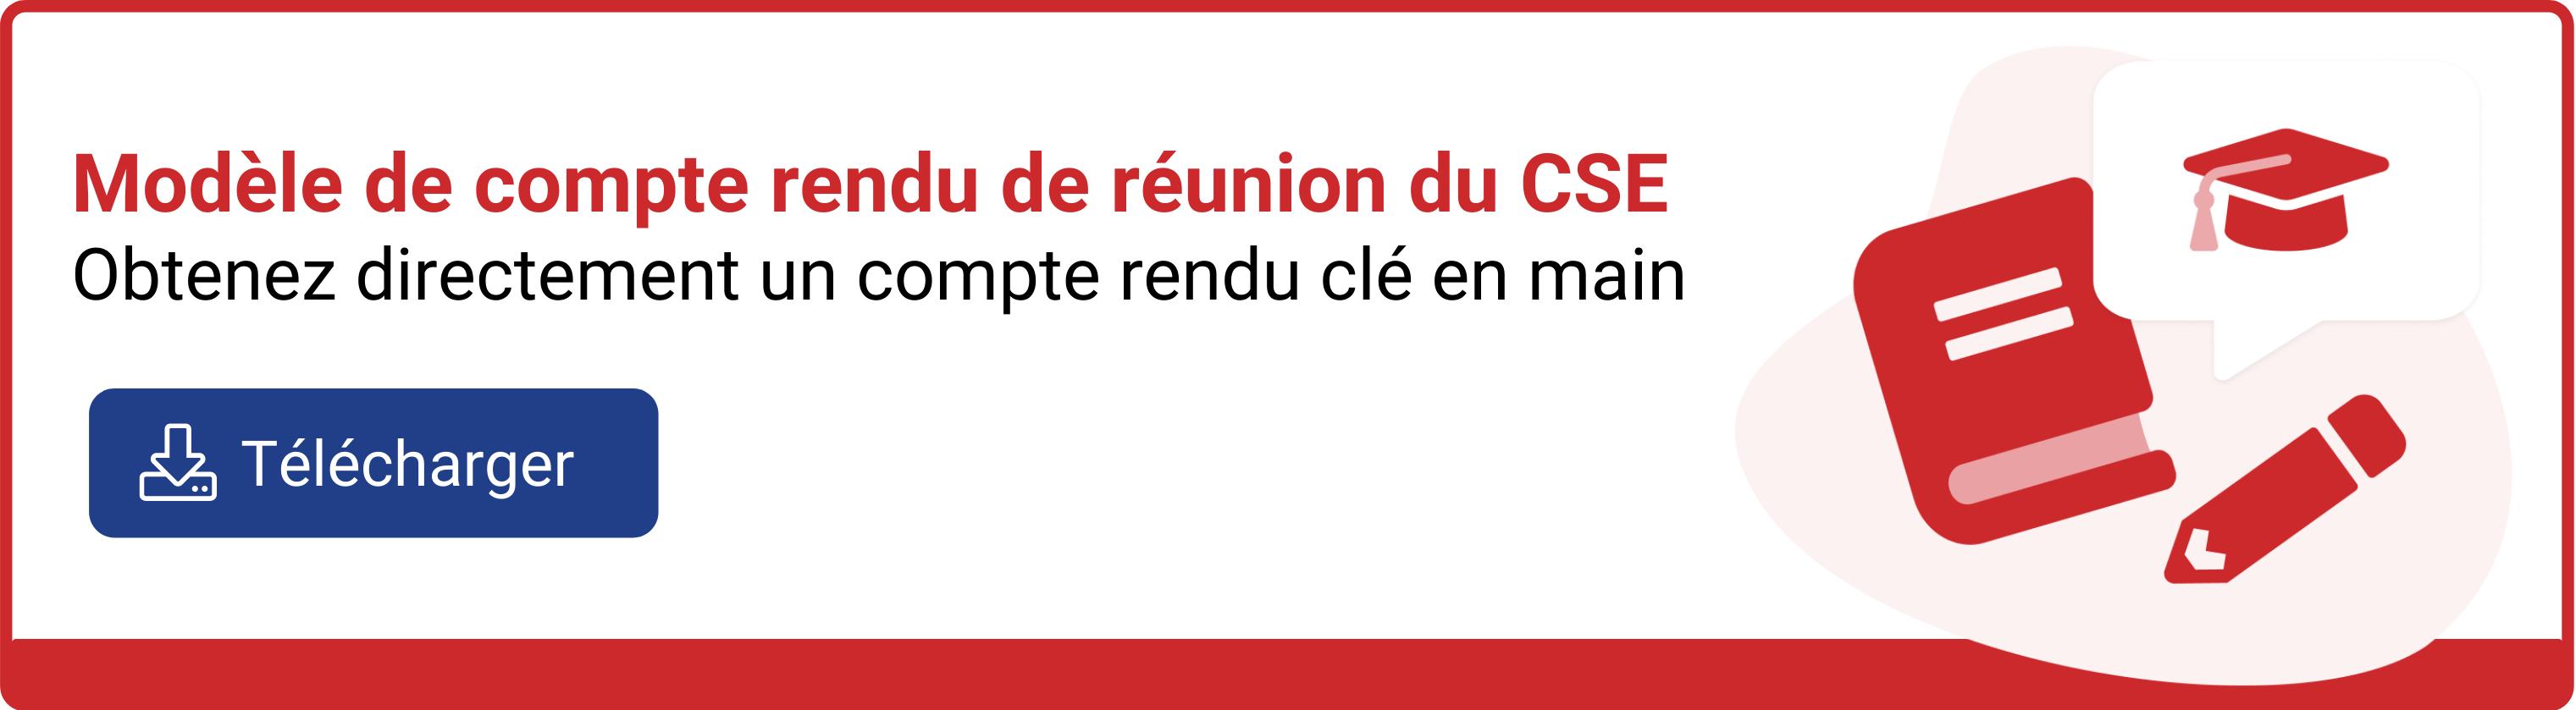 Compte rendu de réunion du CSE